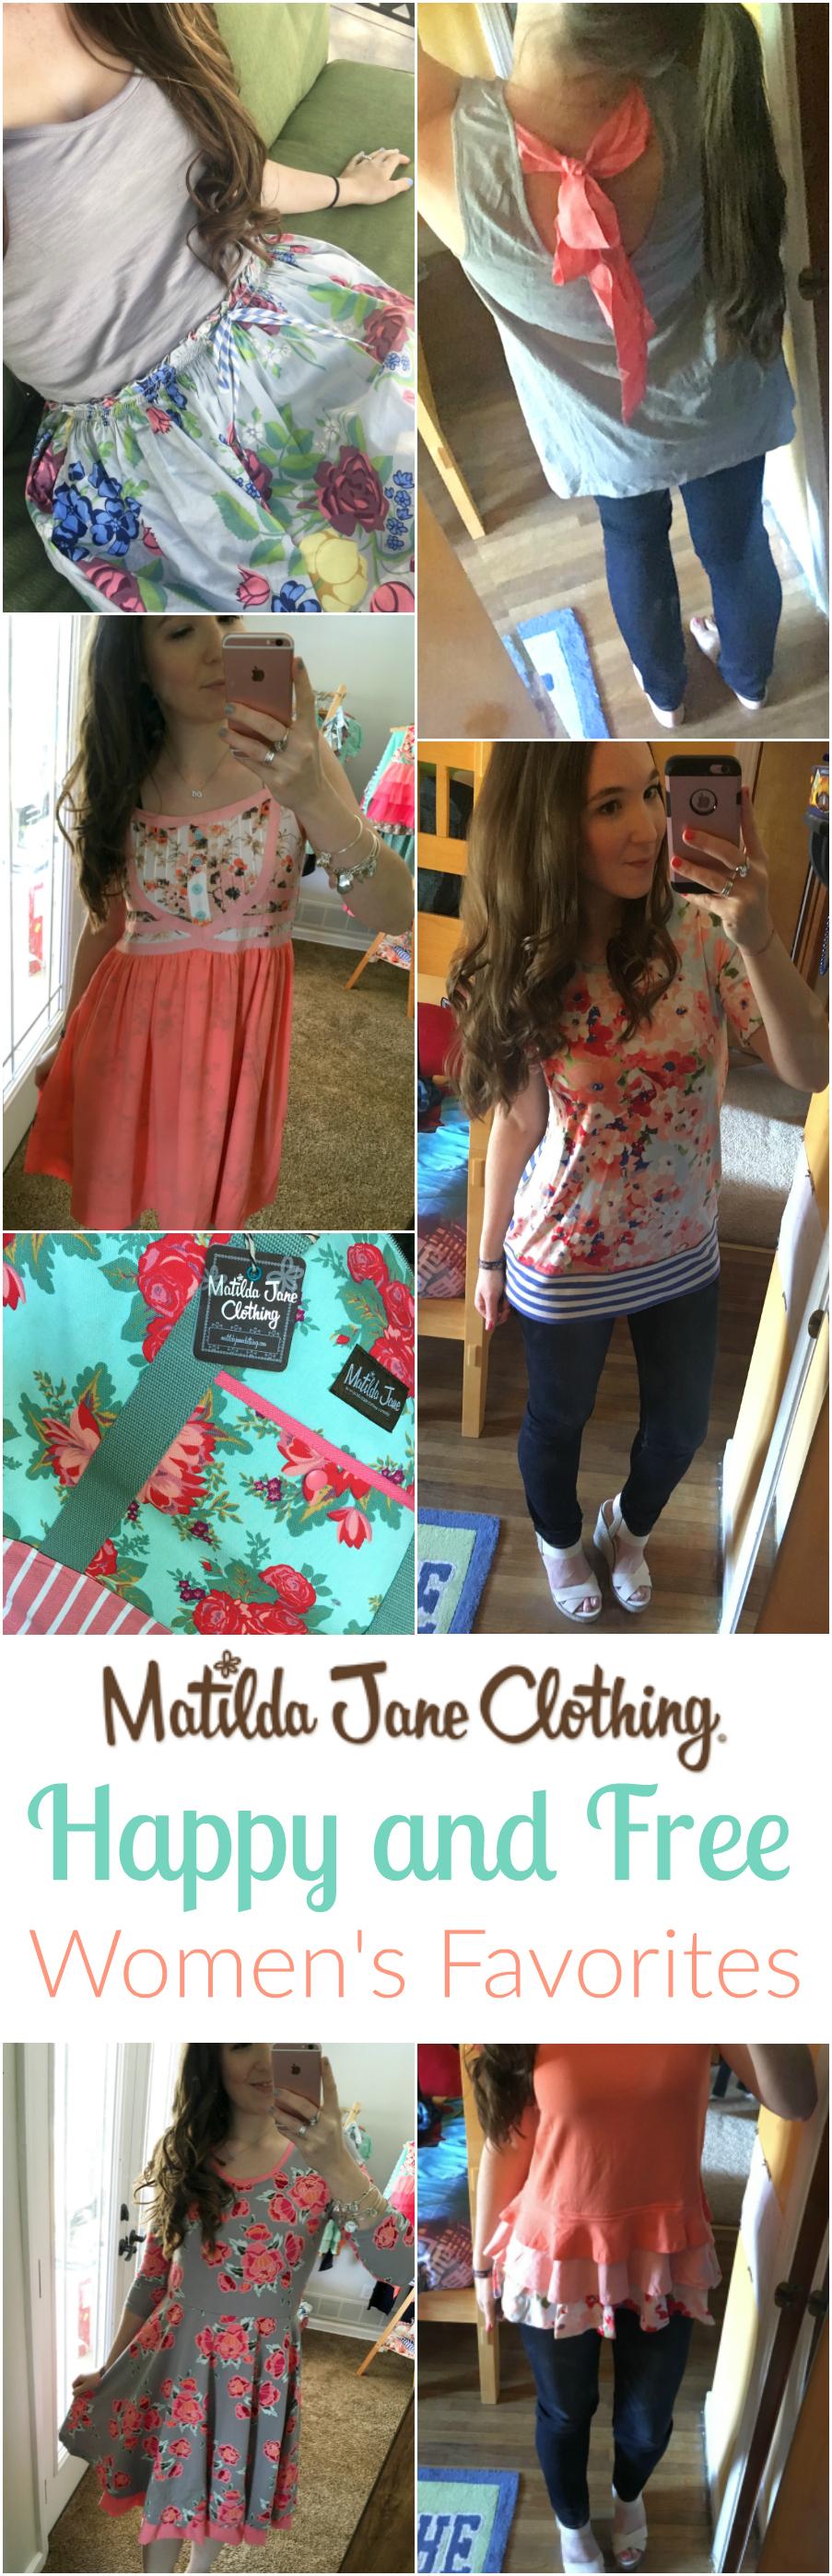 Matilda Jane Clothing Happy and Free Women's Favorites